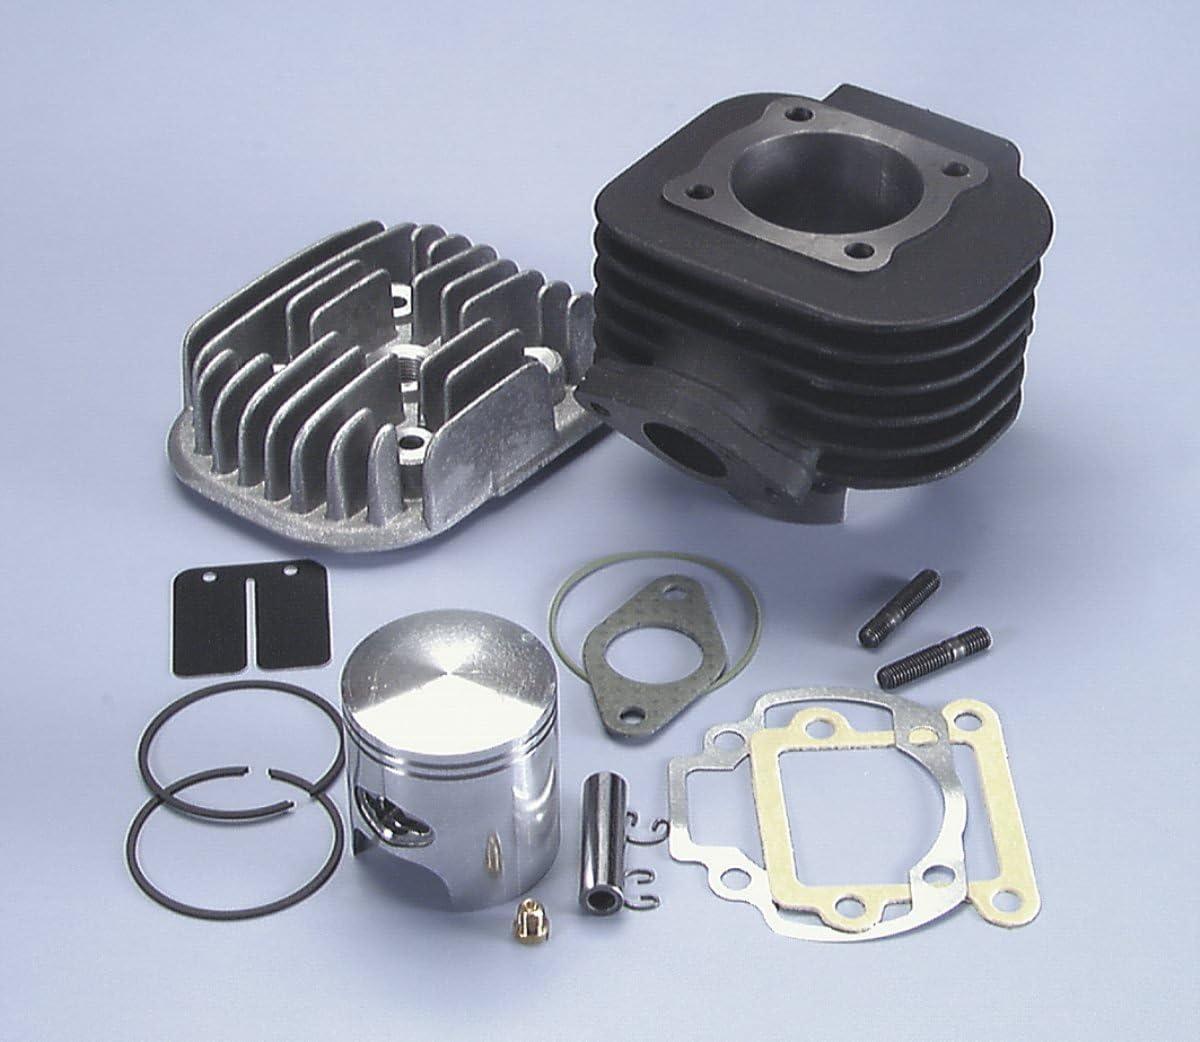 kit cilindro pistone motore POLINI ferro 70cc /Ø47 YAMAHA BWs-MBK Booster 166007